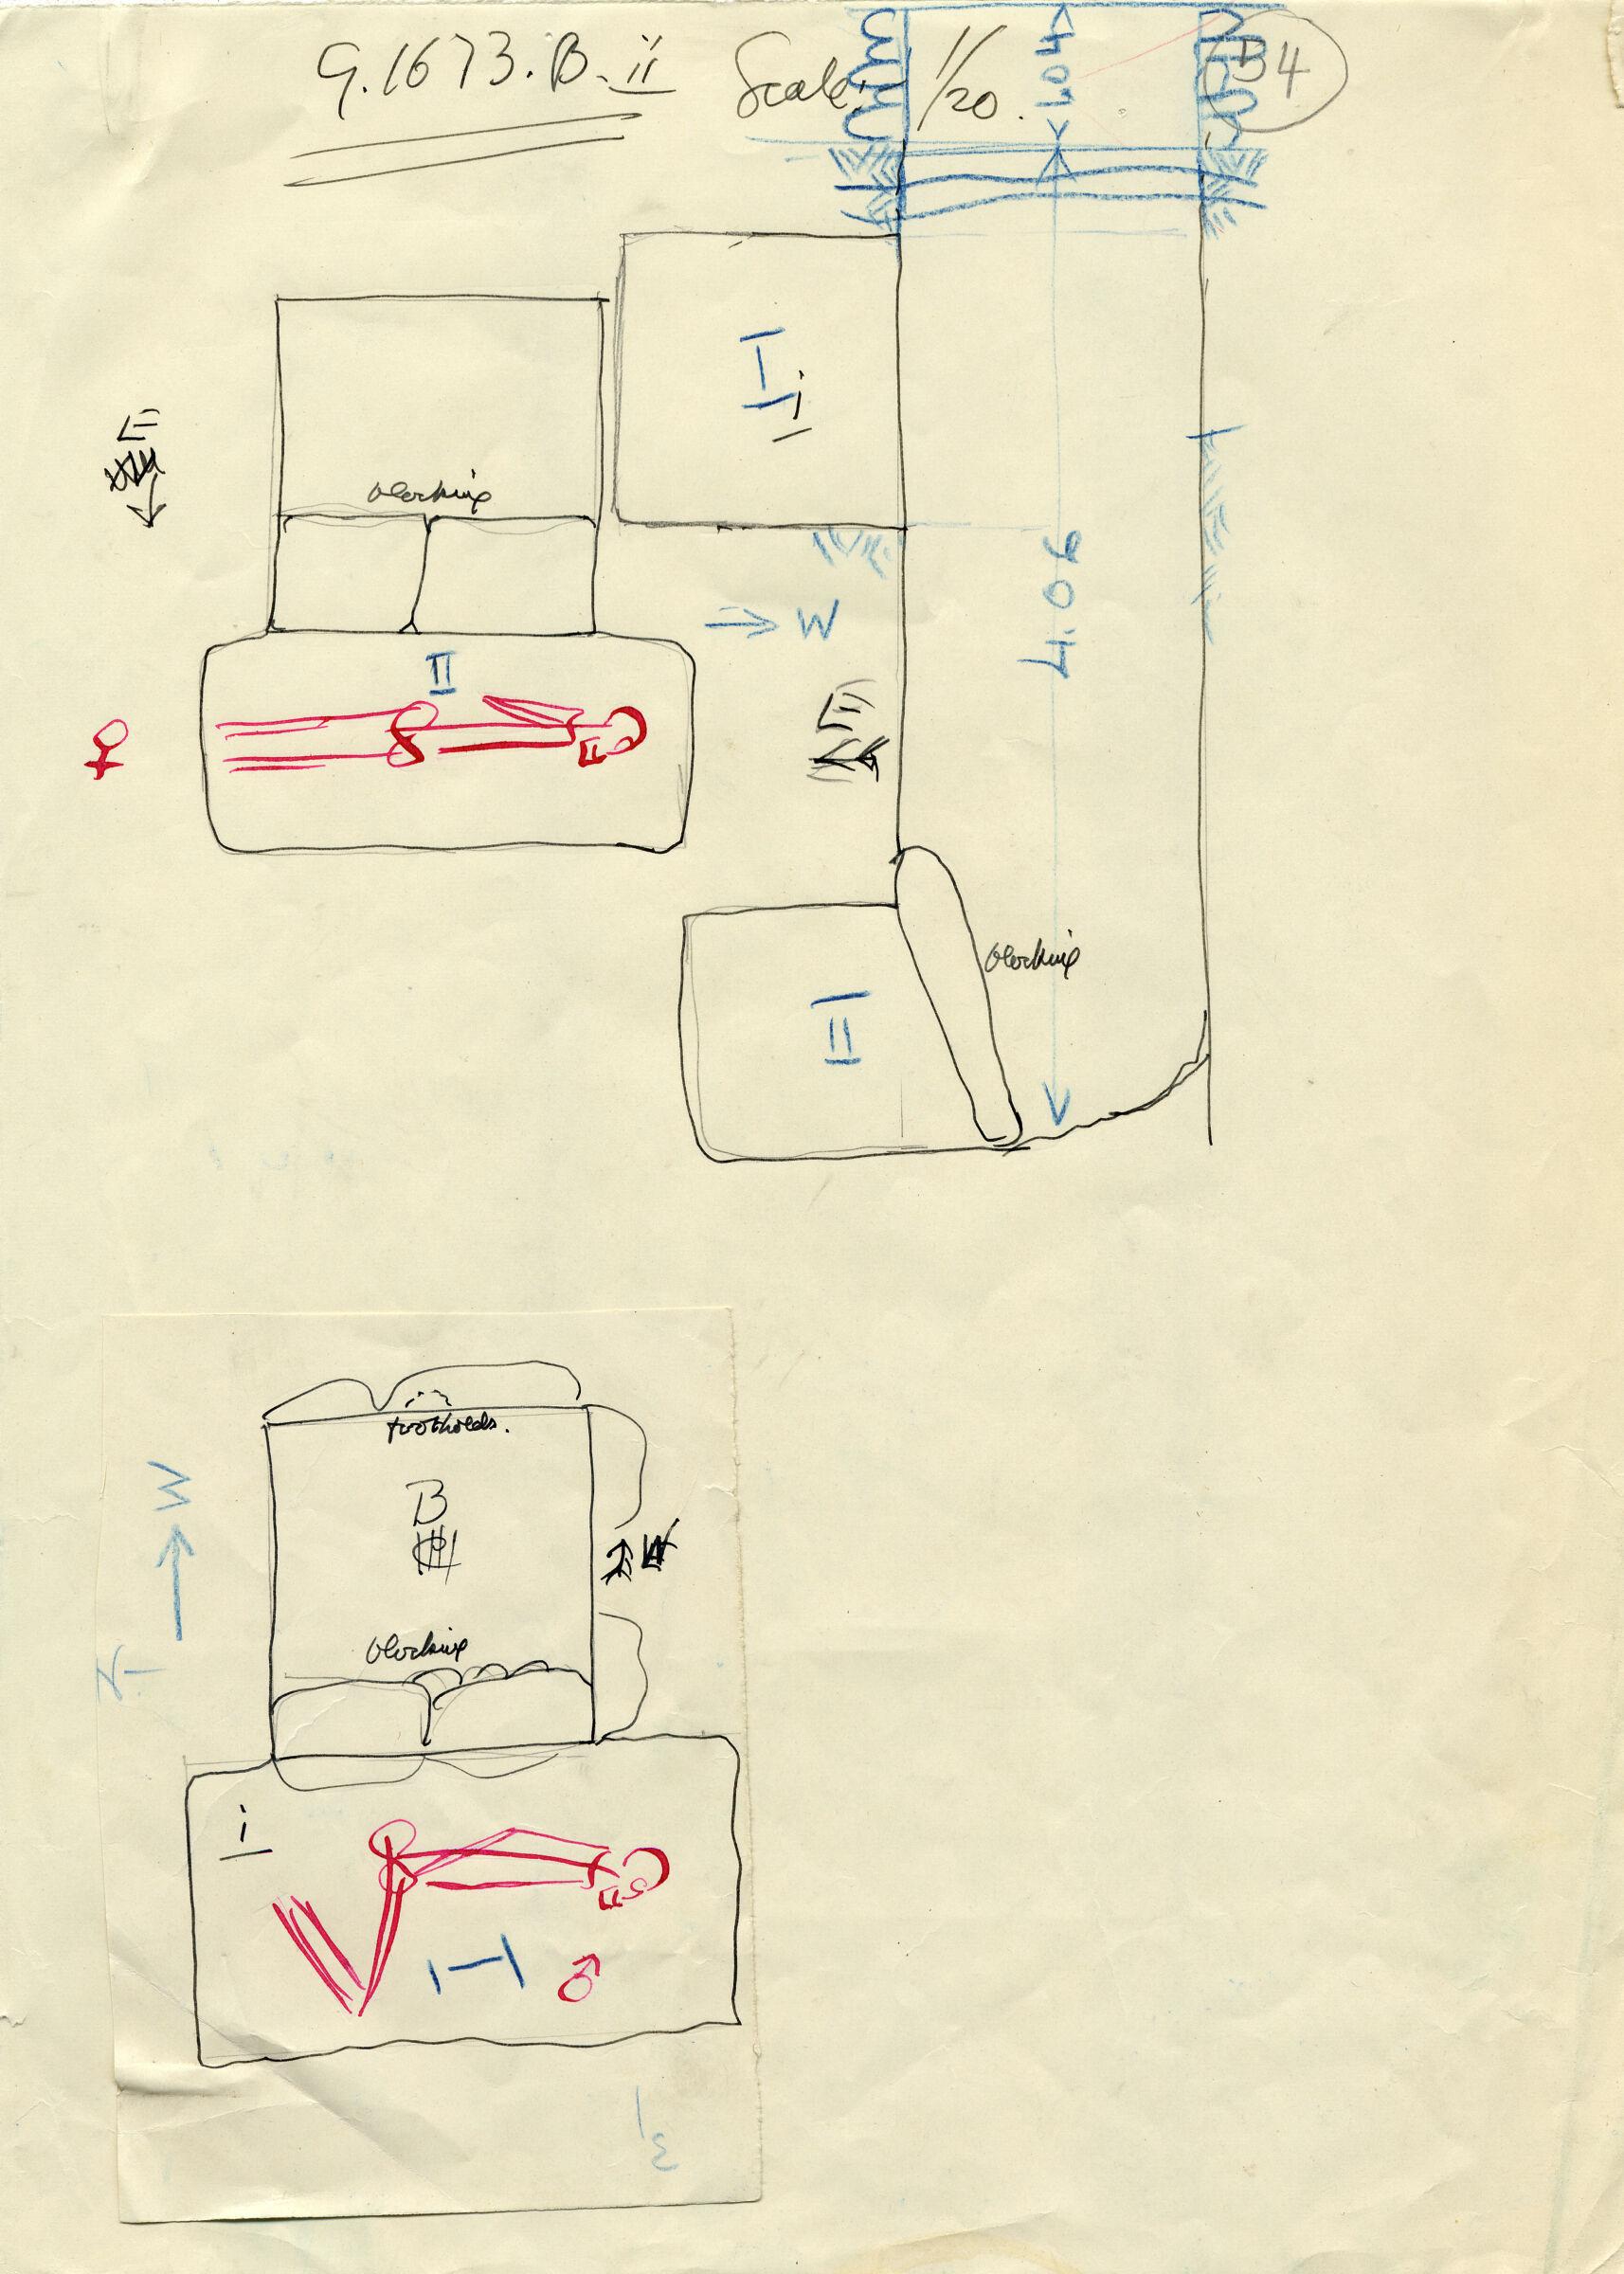 Maps and plans: G 1673, Shaft B (I & II)